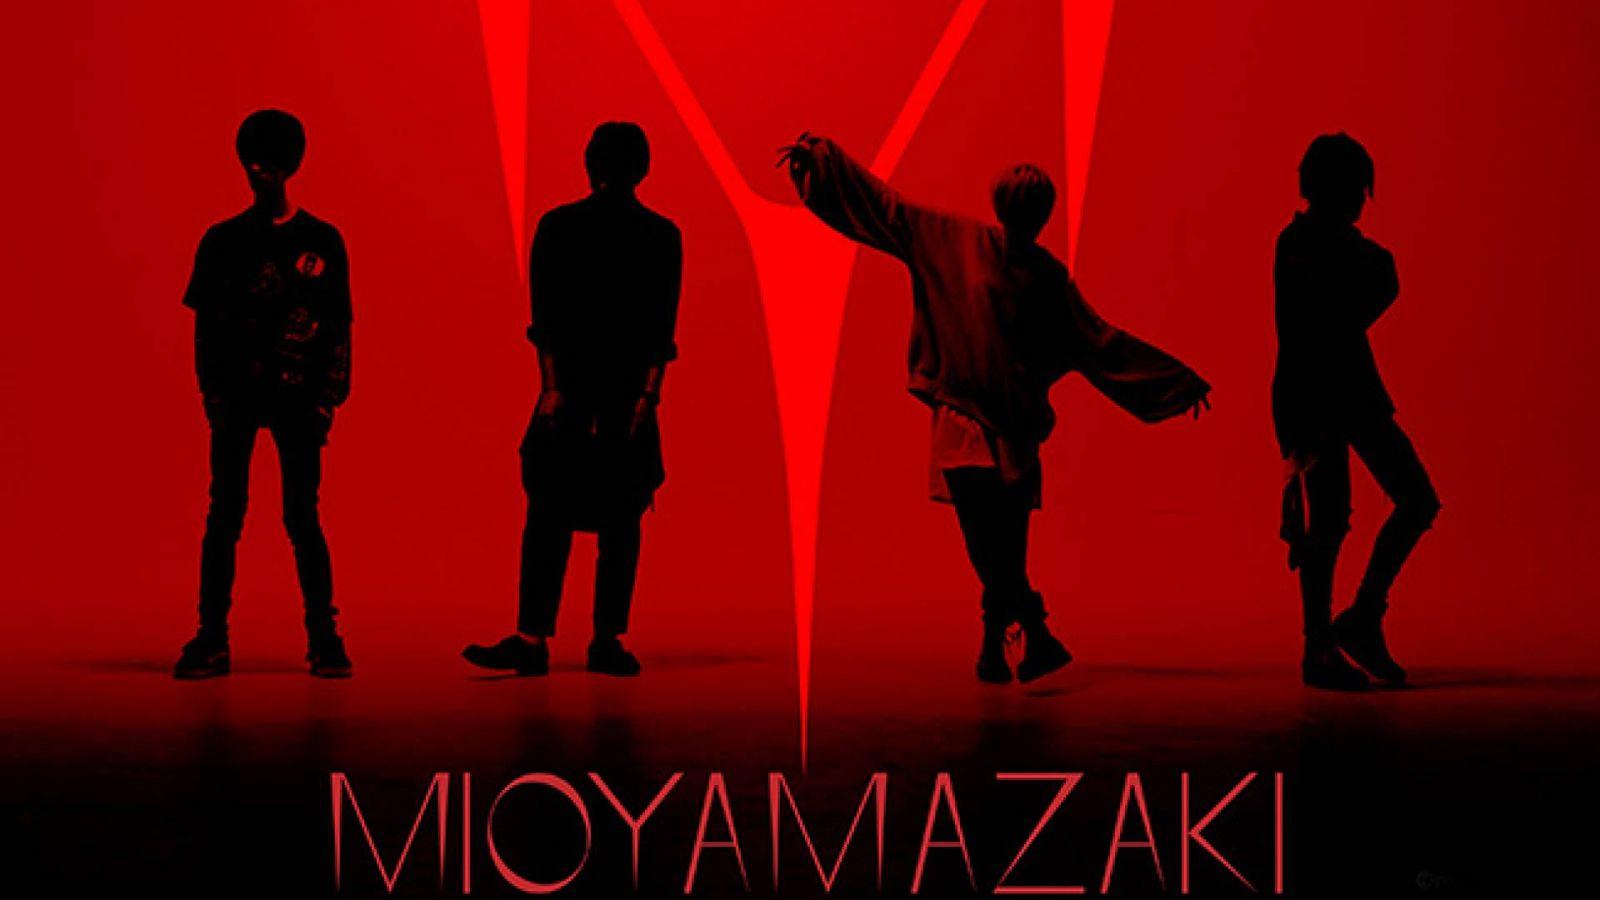 Mio Yamazaki © Mio Yamazaki